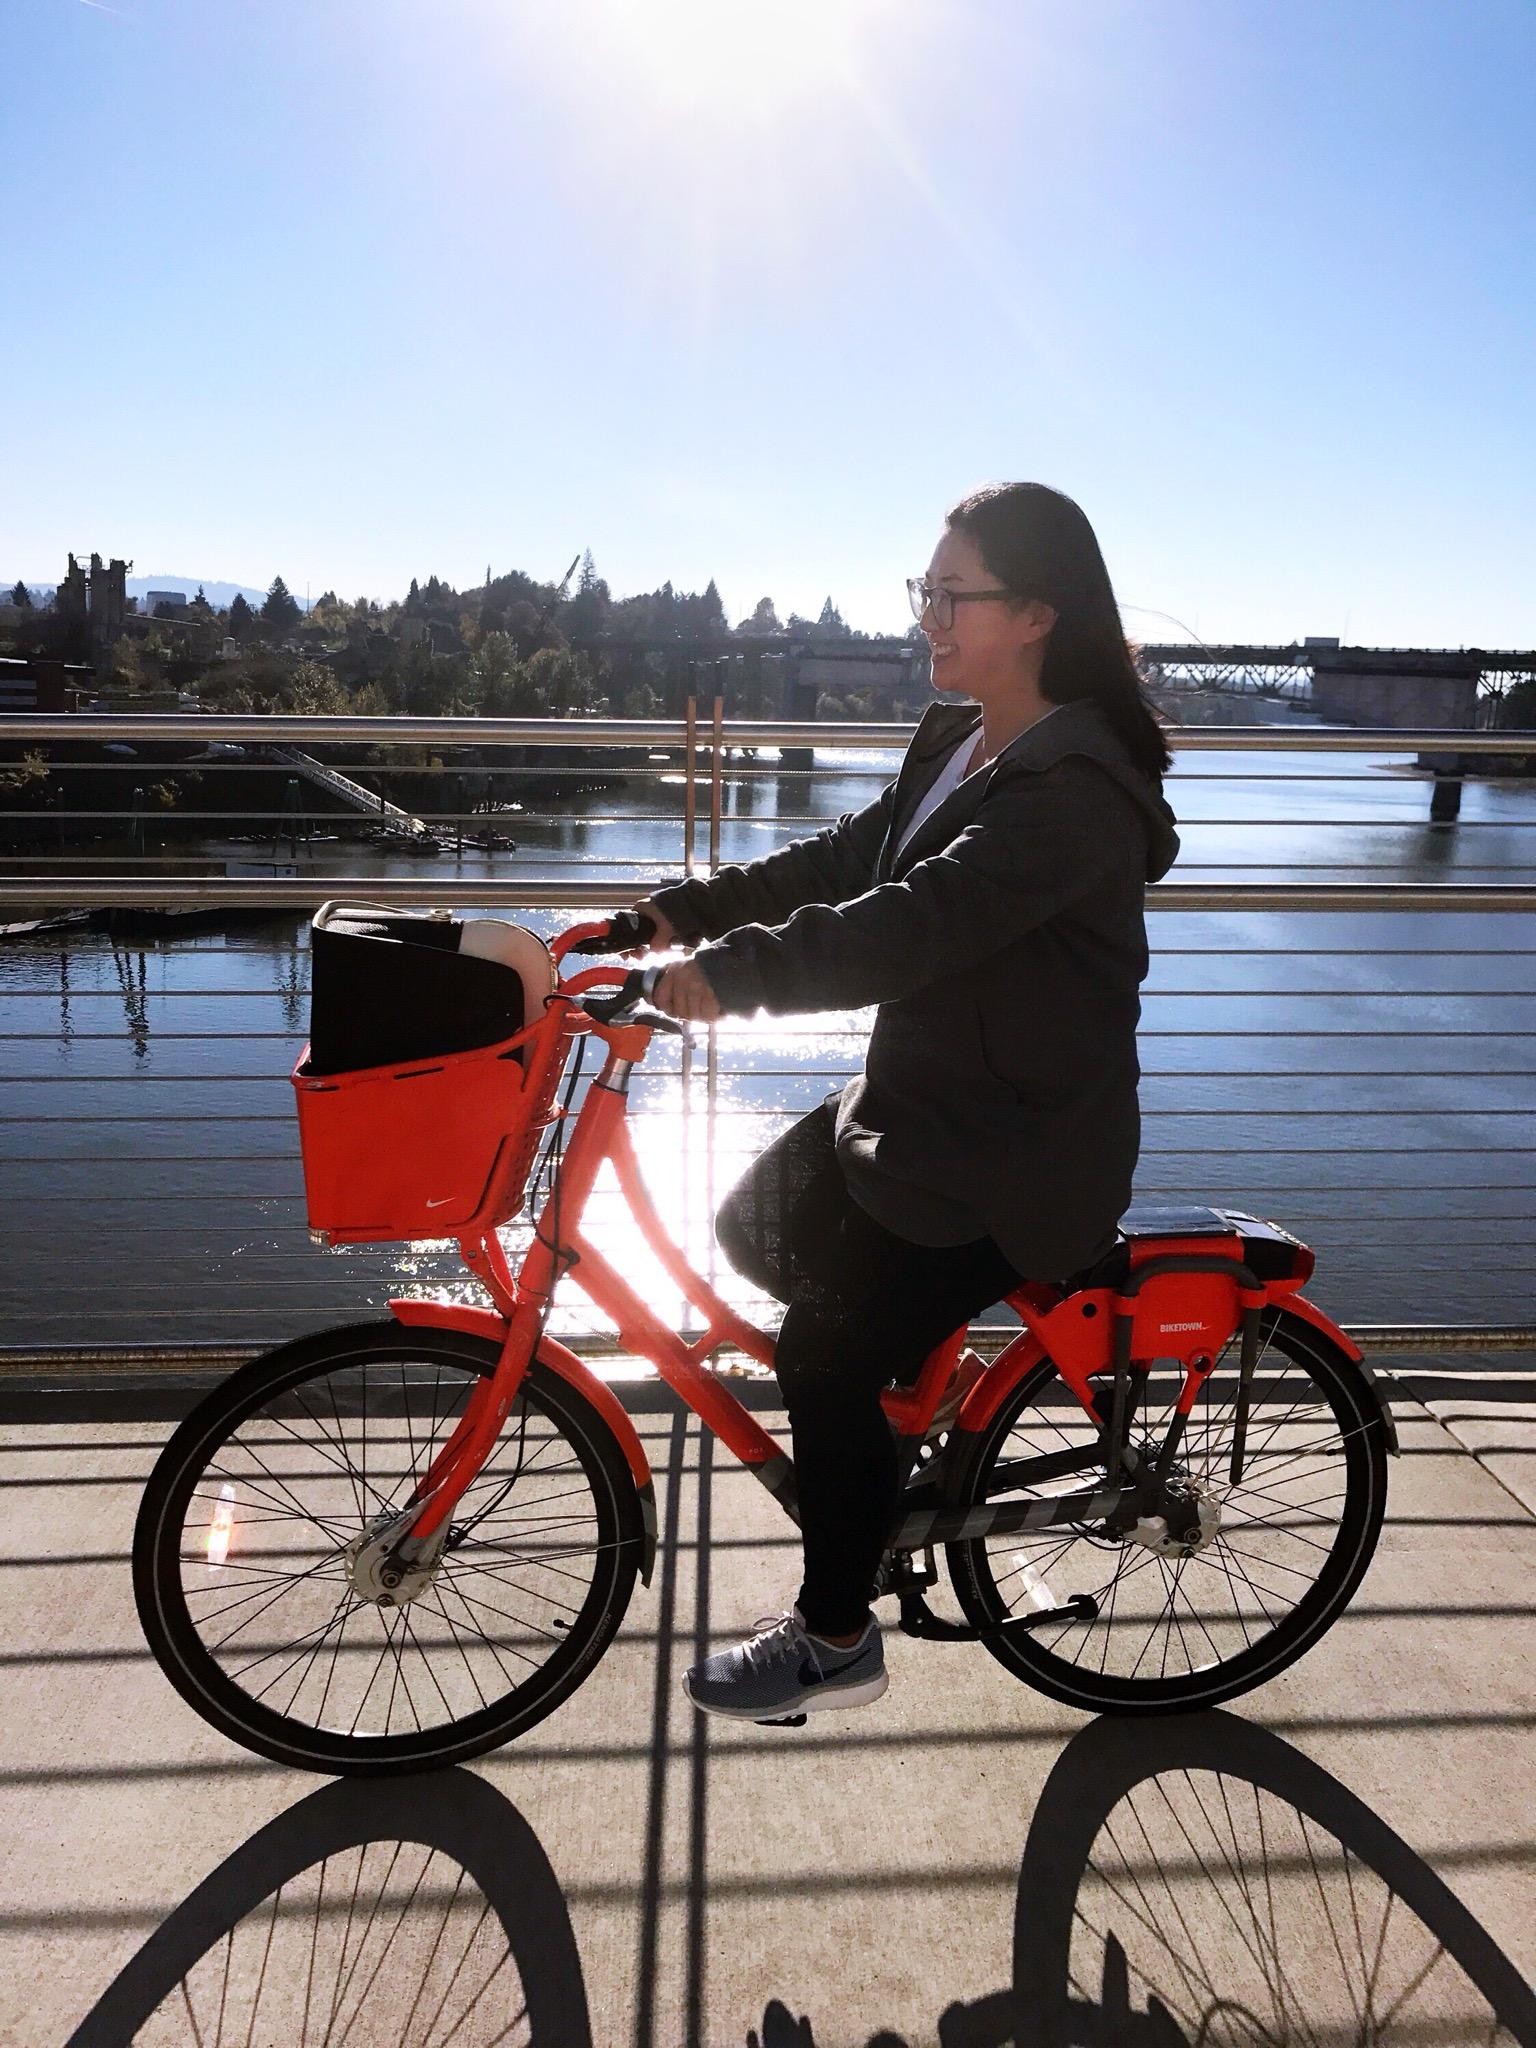 Missy-creed-bike-share-program-portland-or